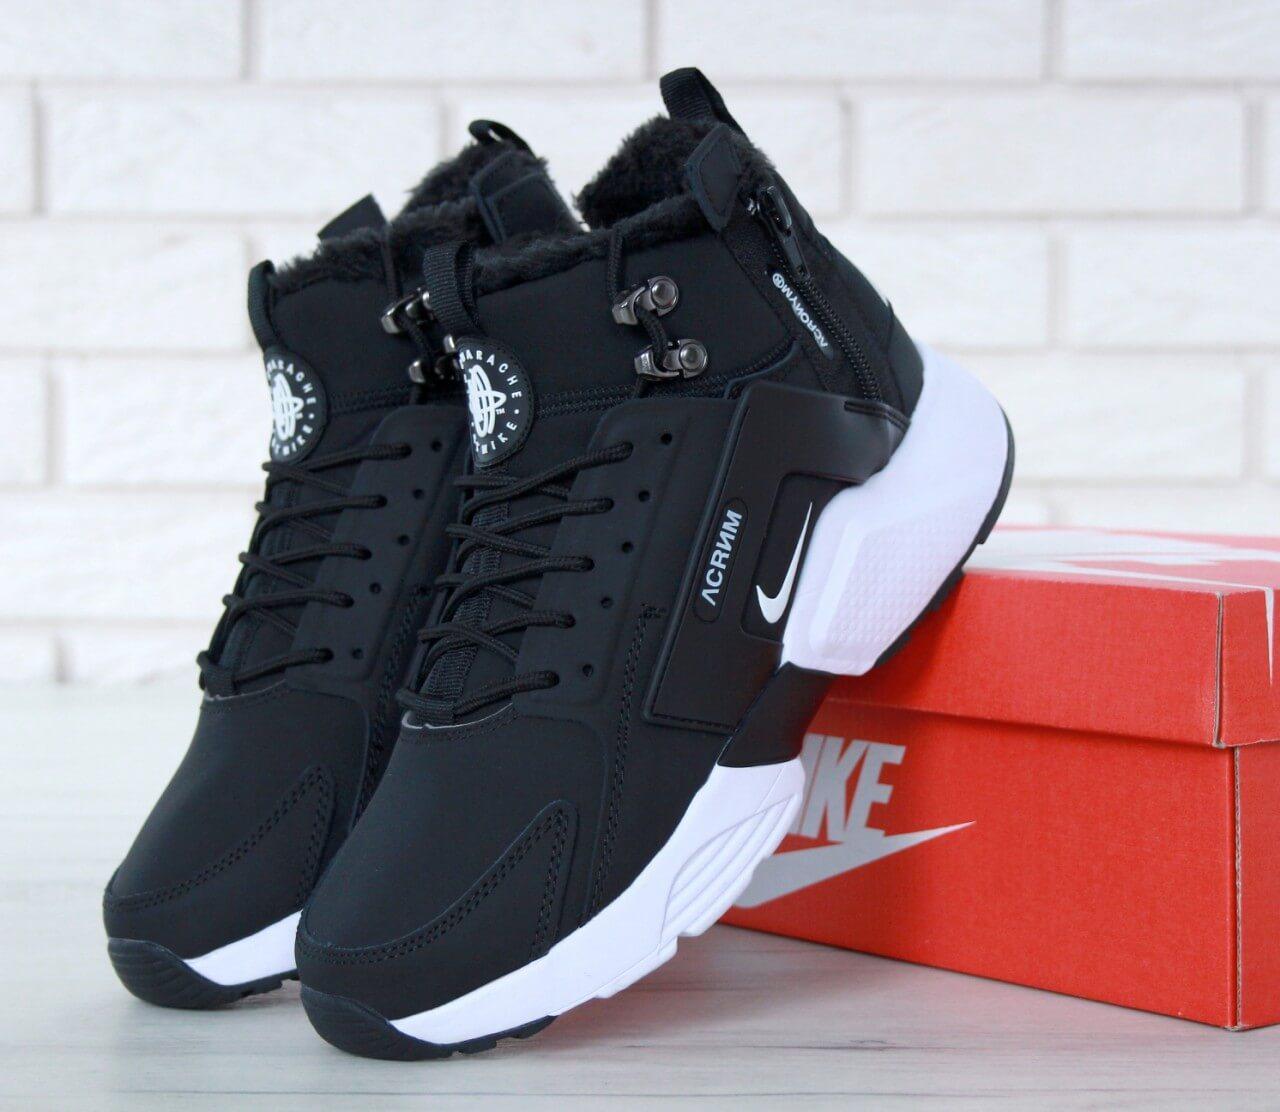 Мужские зимние кроссовки на меху Nike Huarache X Acronym City Winter Black White, фото 1